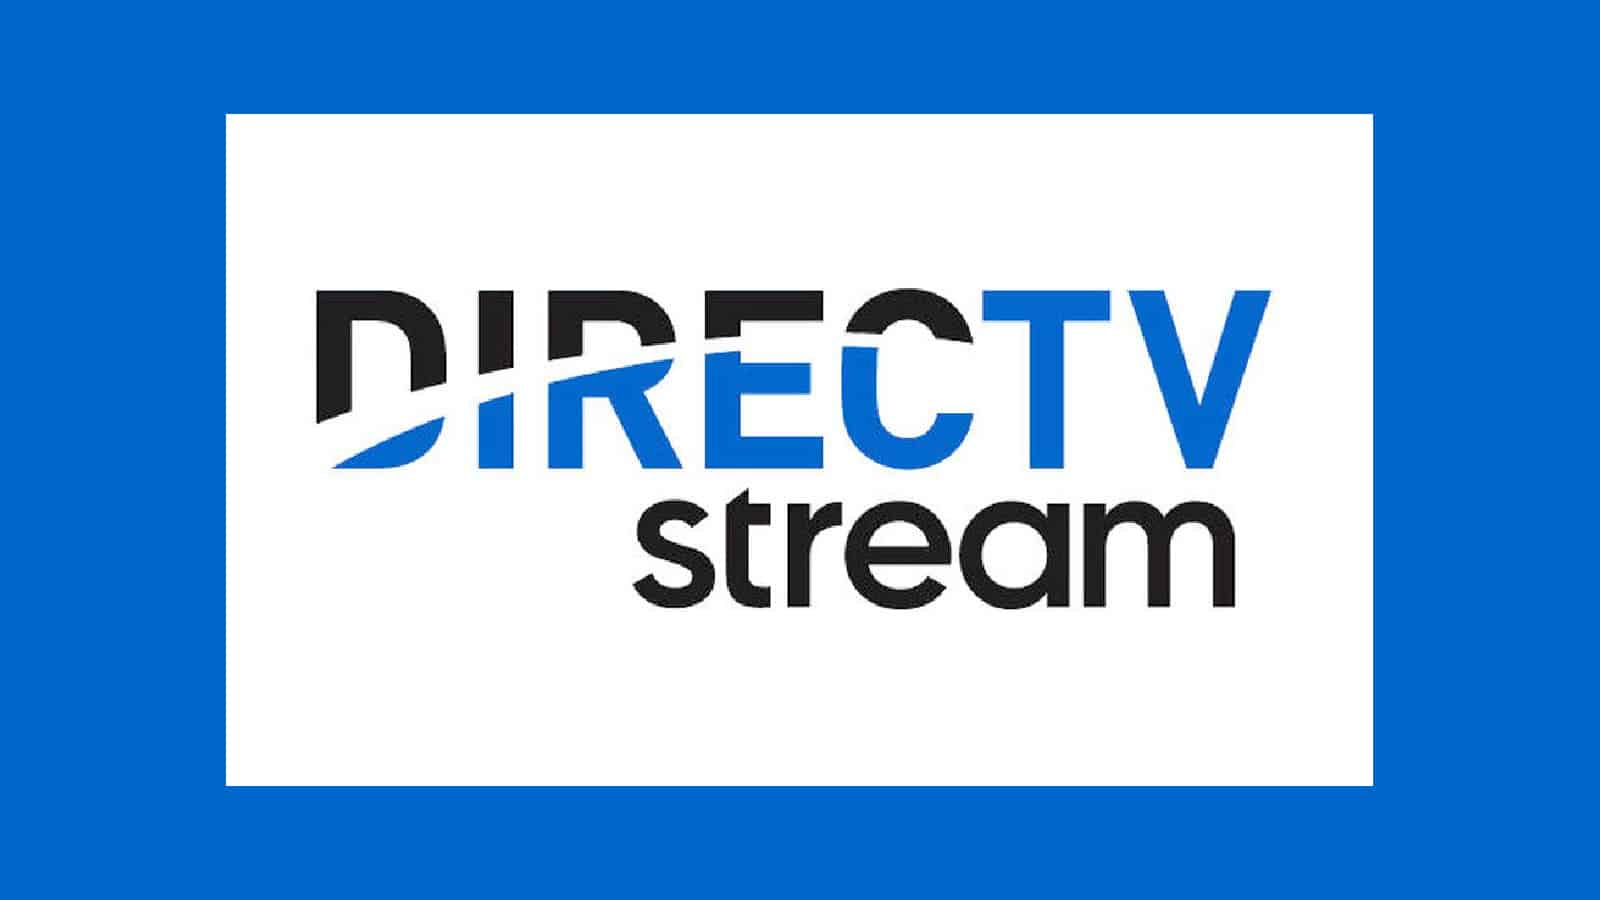 Directv stream AM AH